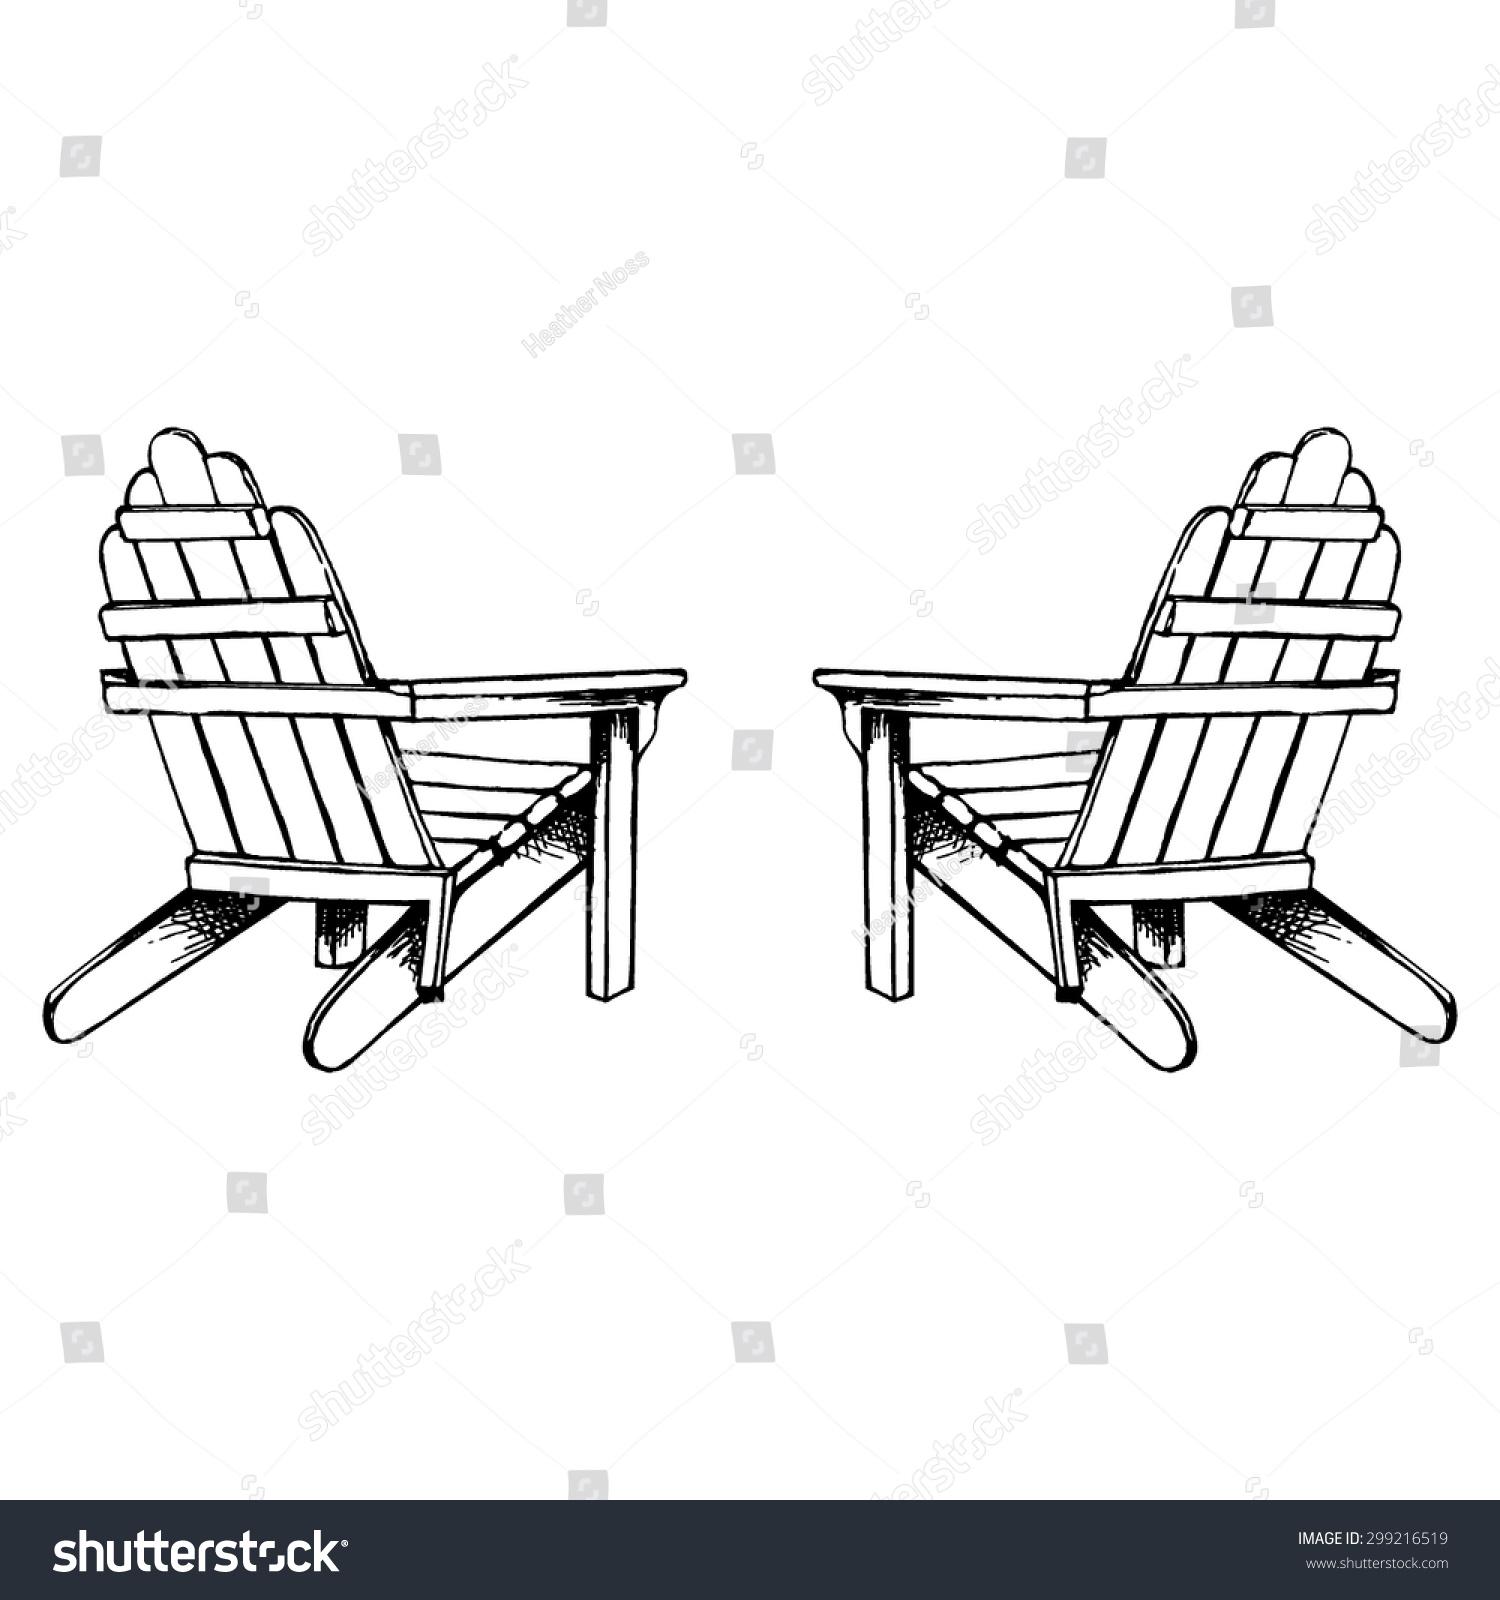 adirondack chairs hand sketch stock vector 299216519 shutterstock